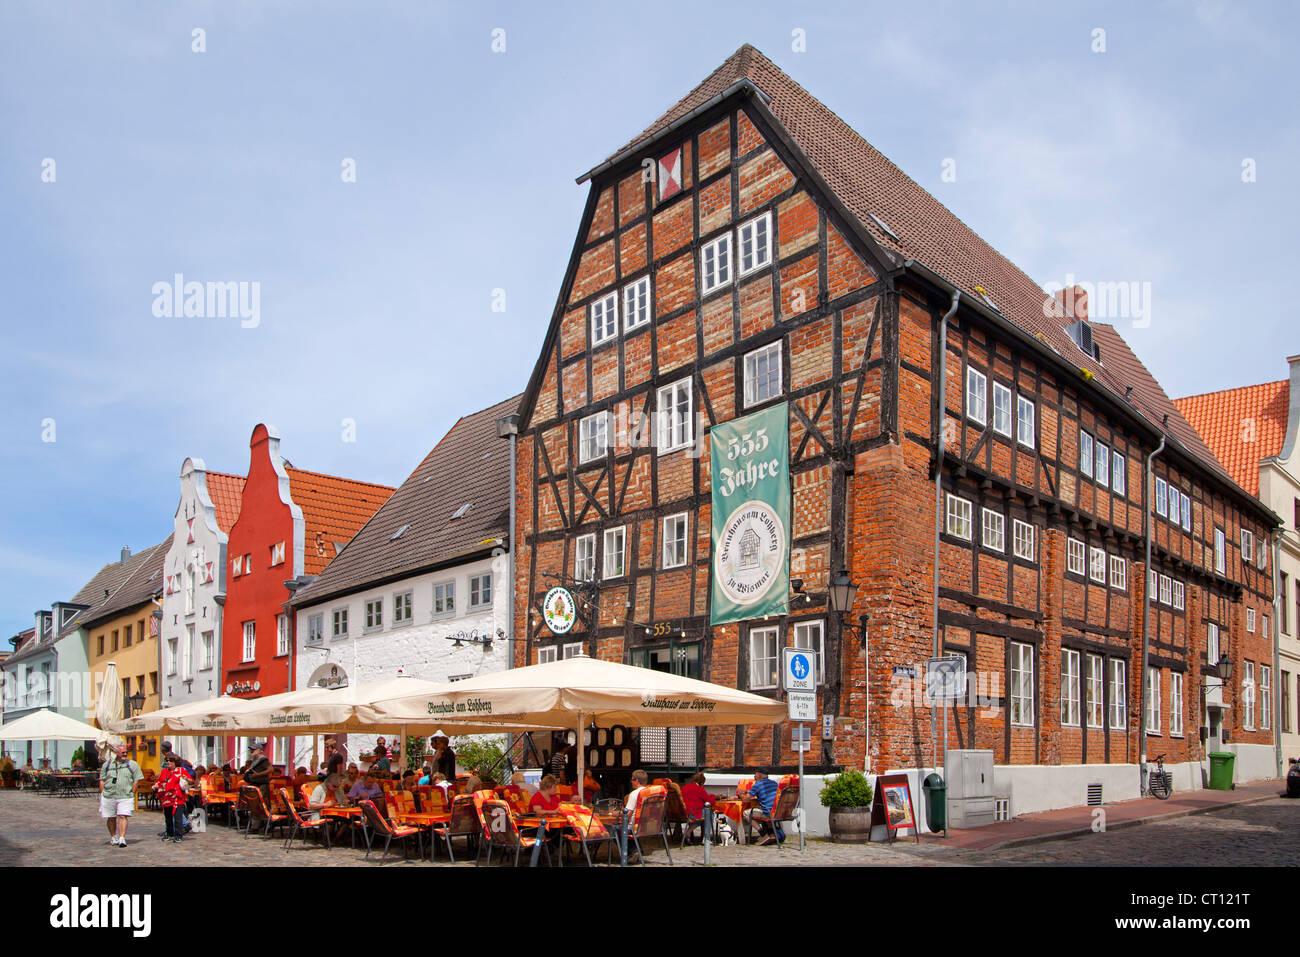 restaurants, Am Lohberg, Wismar, Mecklenburg-West Pomerania, Germany Stock Photo